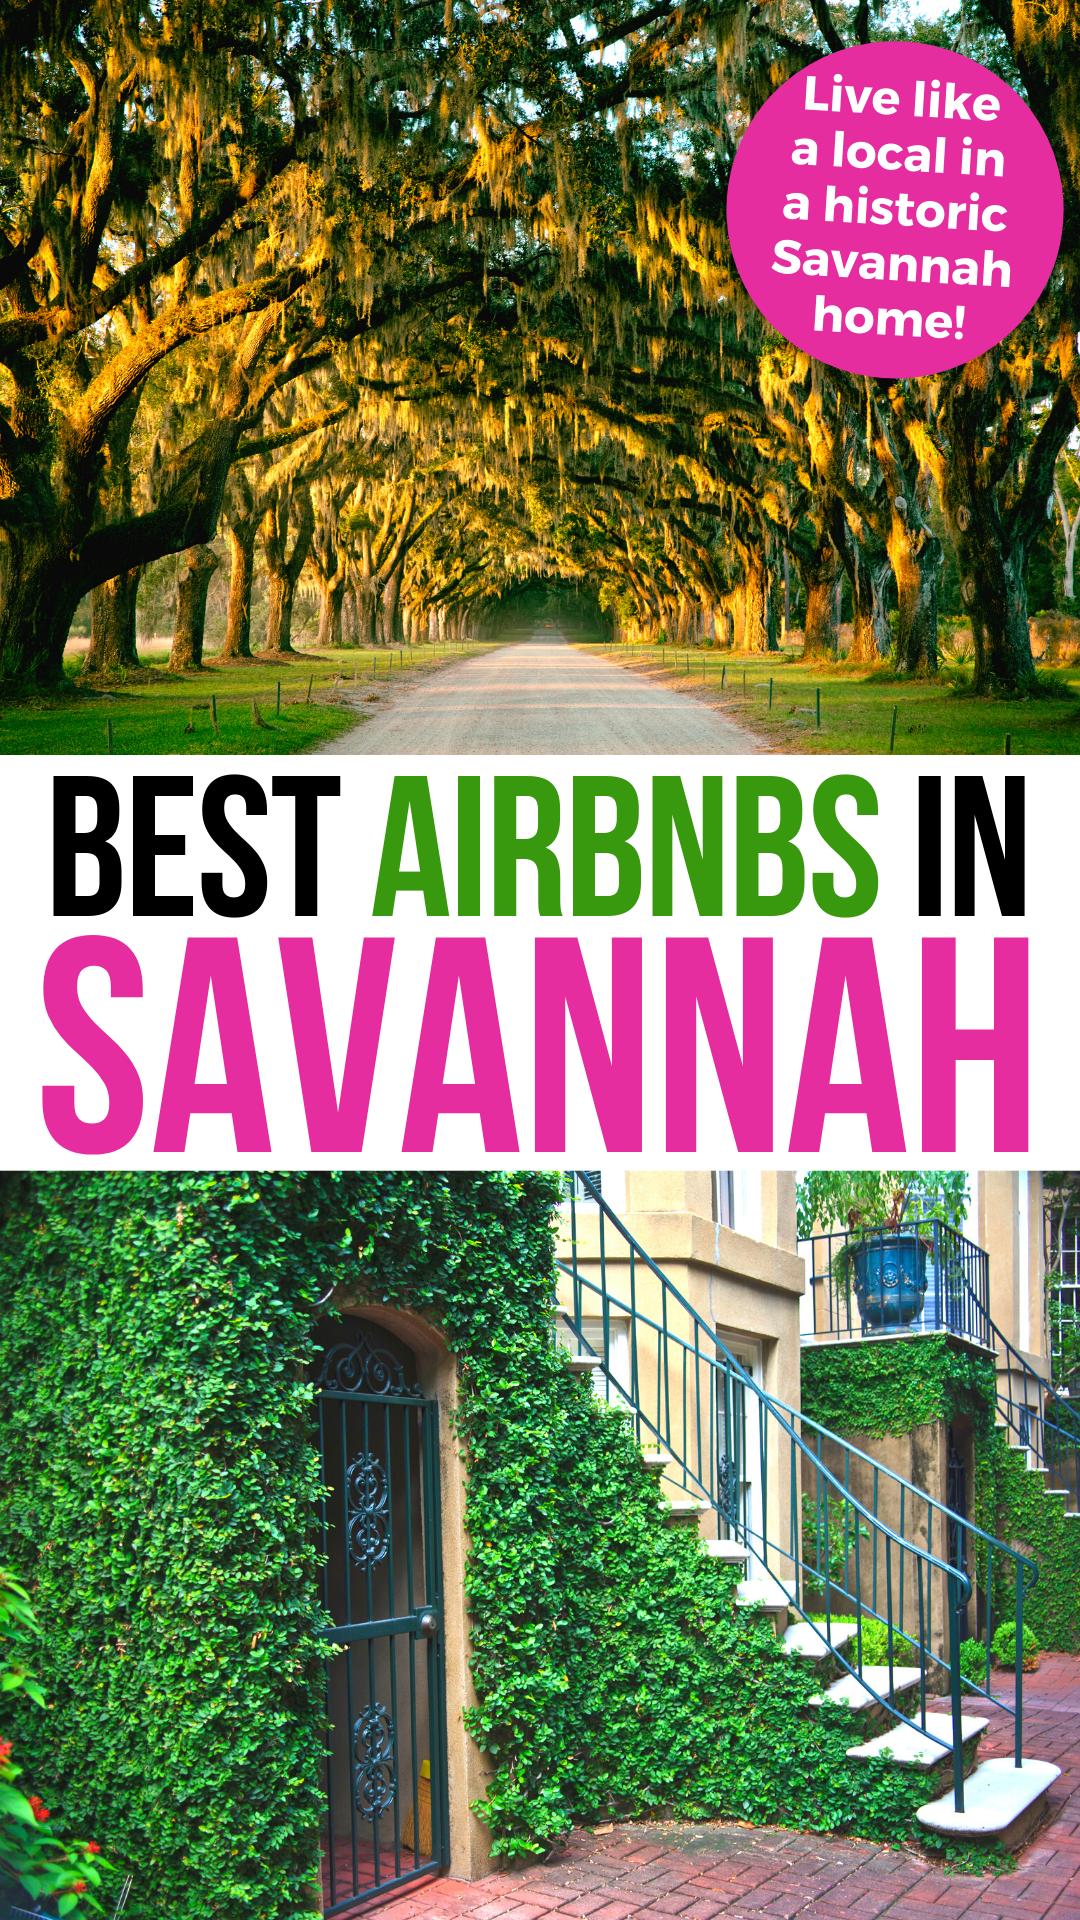 Airbnb Savannah Georgia Historic Stays Neighborhood Tips Savannah Chat Savannah Georgia Travel Savannah